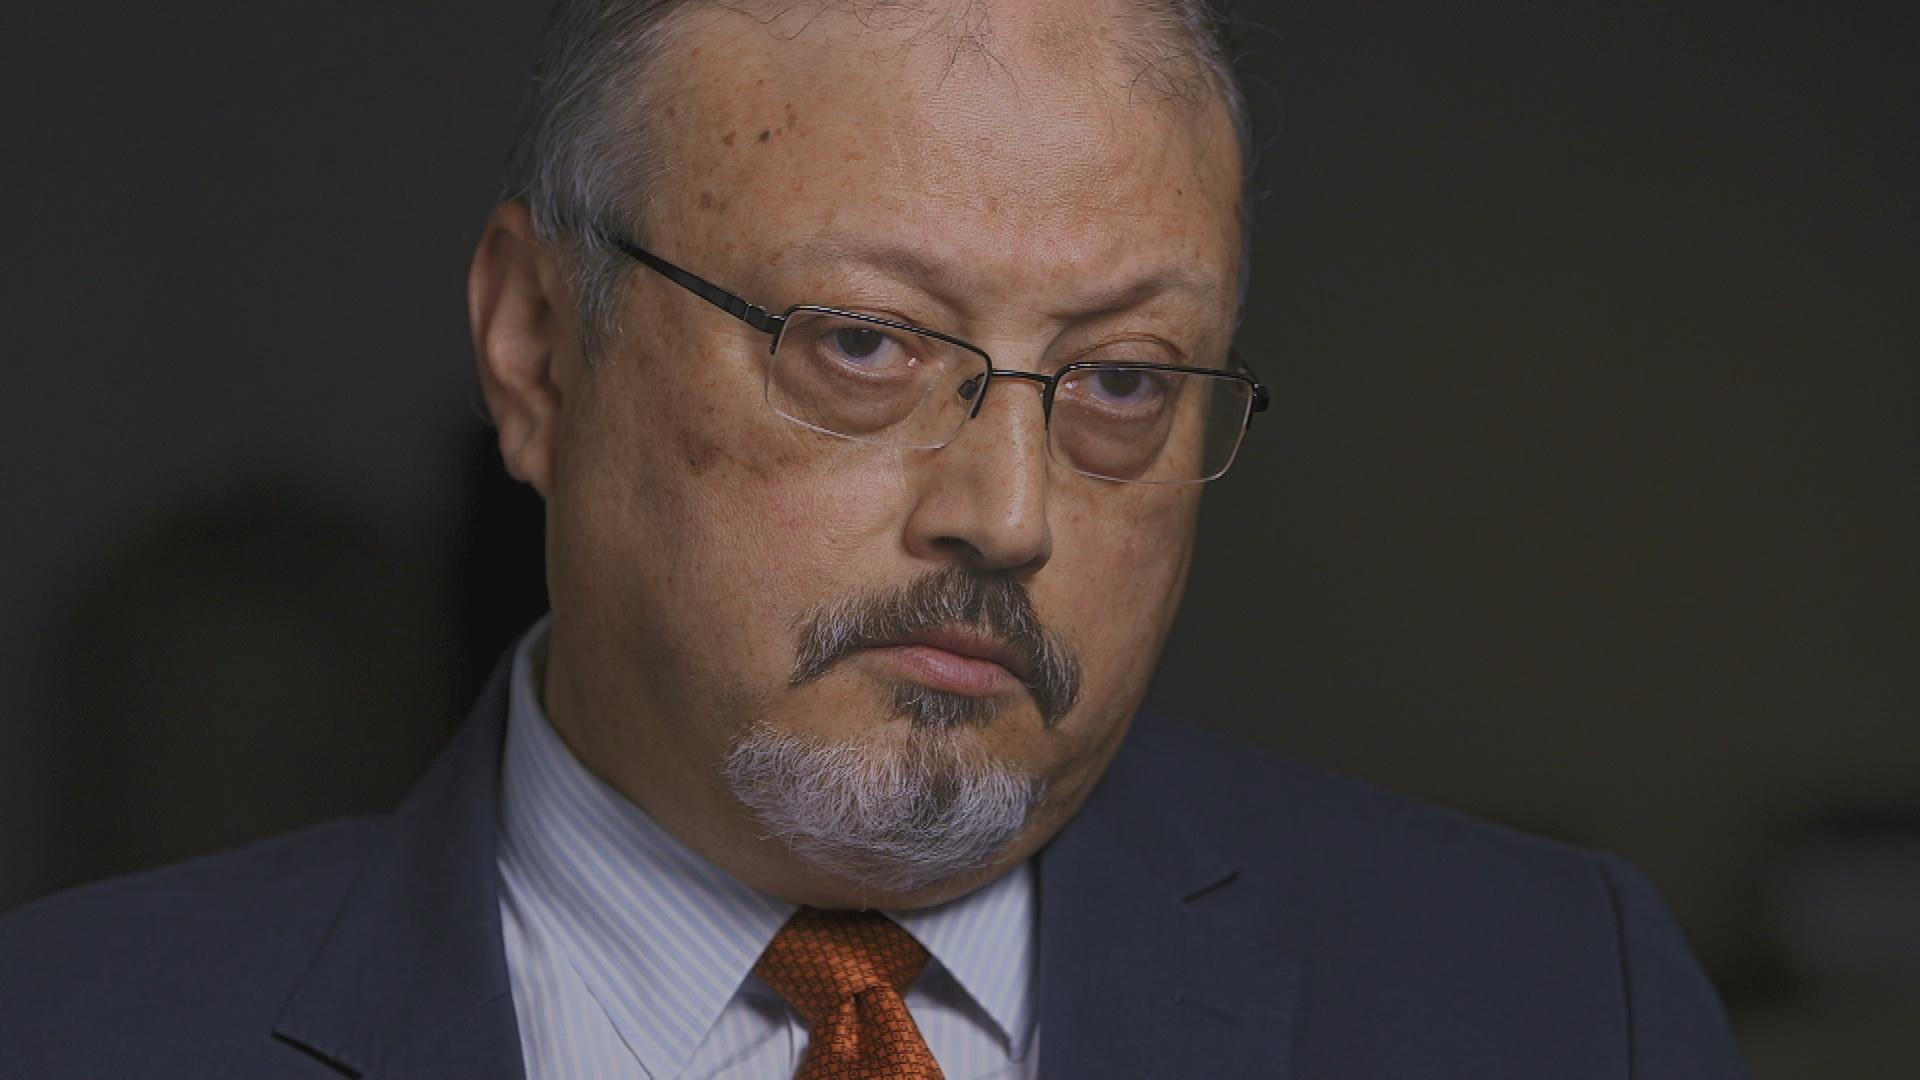 Inside Jamal Khashoggi's Decision to Speak Out Aga